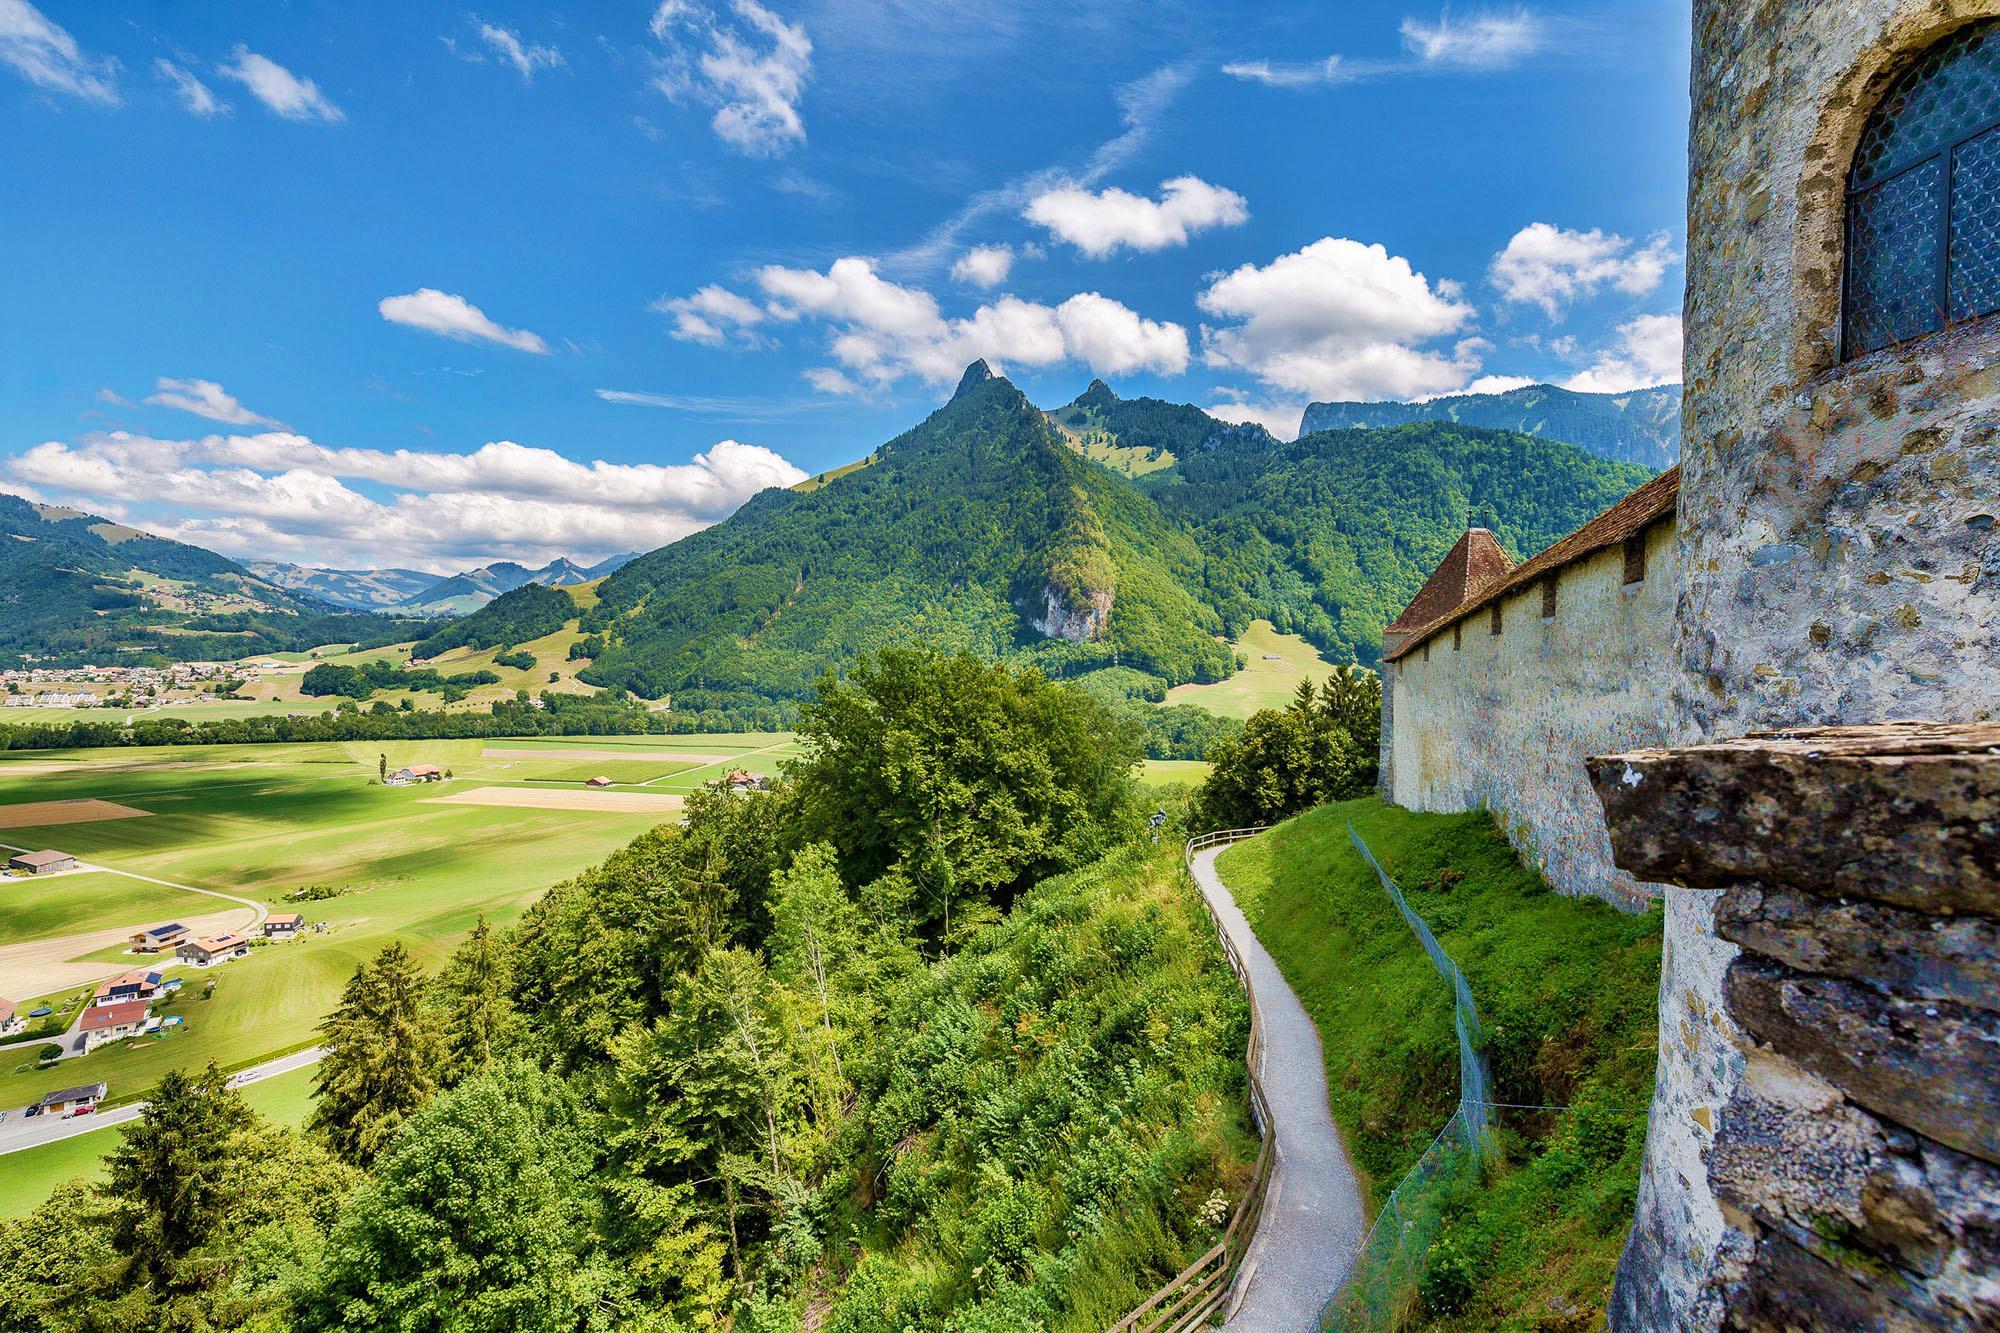 kt_2020_350_Keytours_excursions_Swisstours_gruyères_village10_2048_10